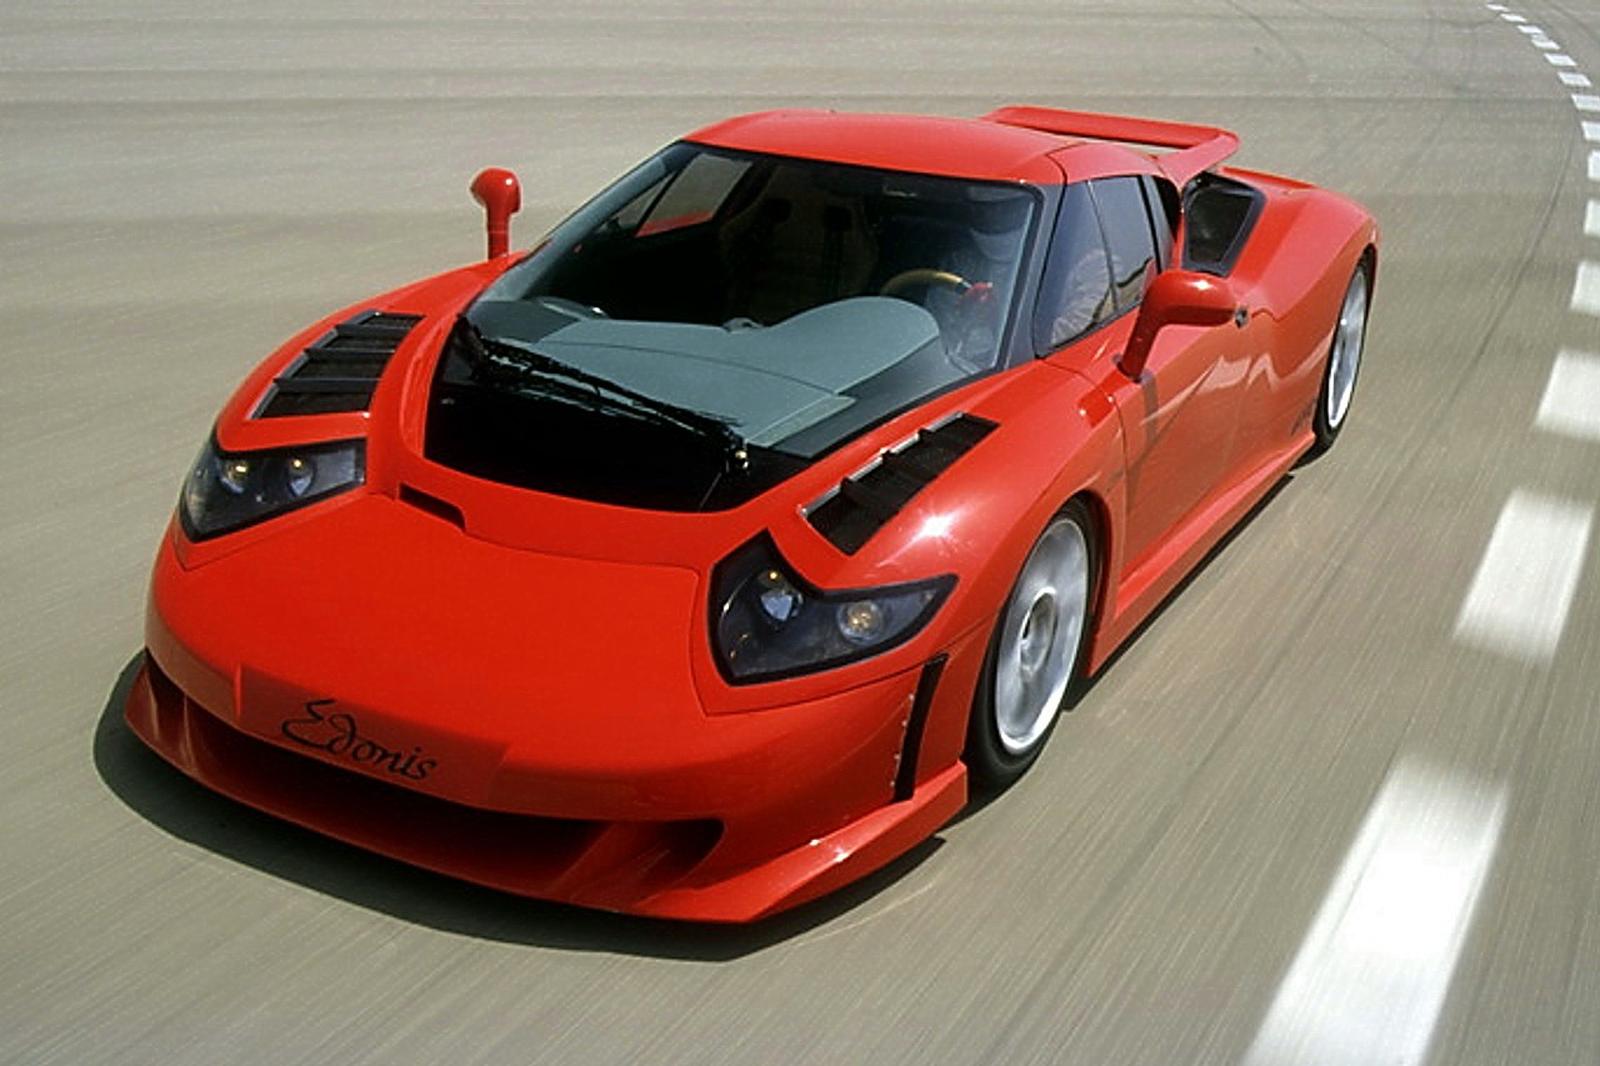 Bugatti EB110 resurrected as SP-110 Edonis Fenice